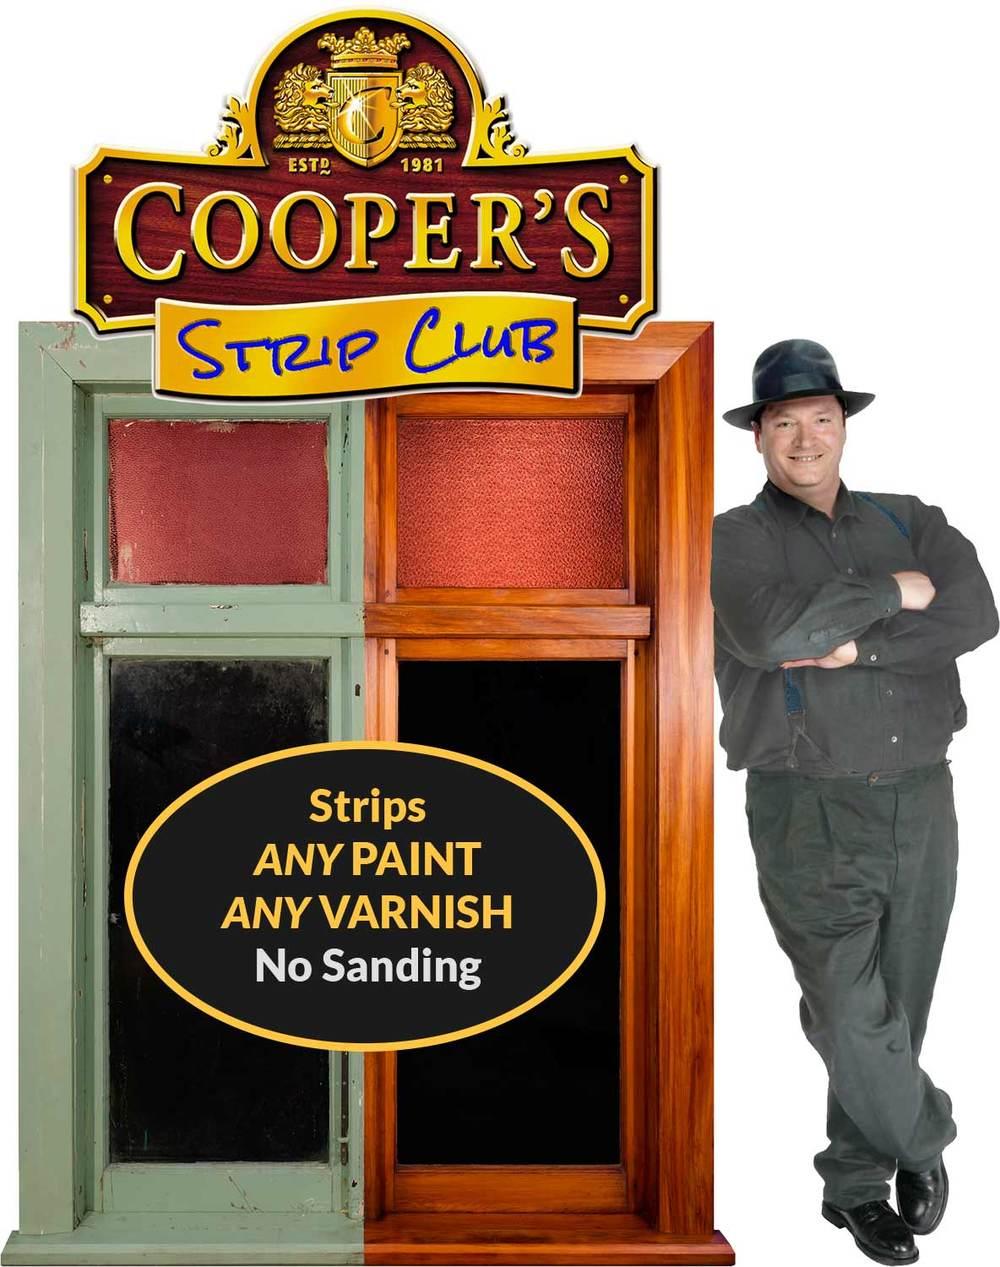 Simon Cooper - Inventor